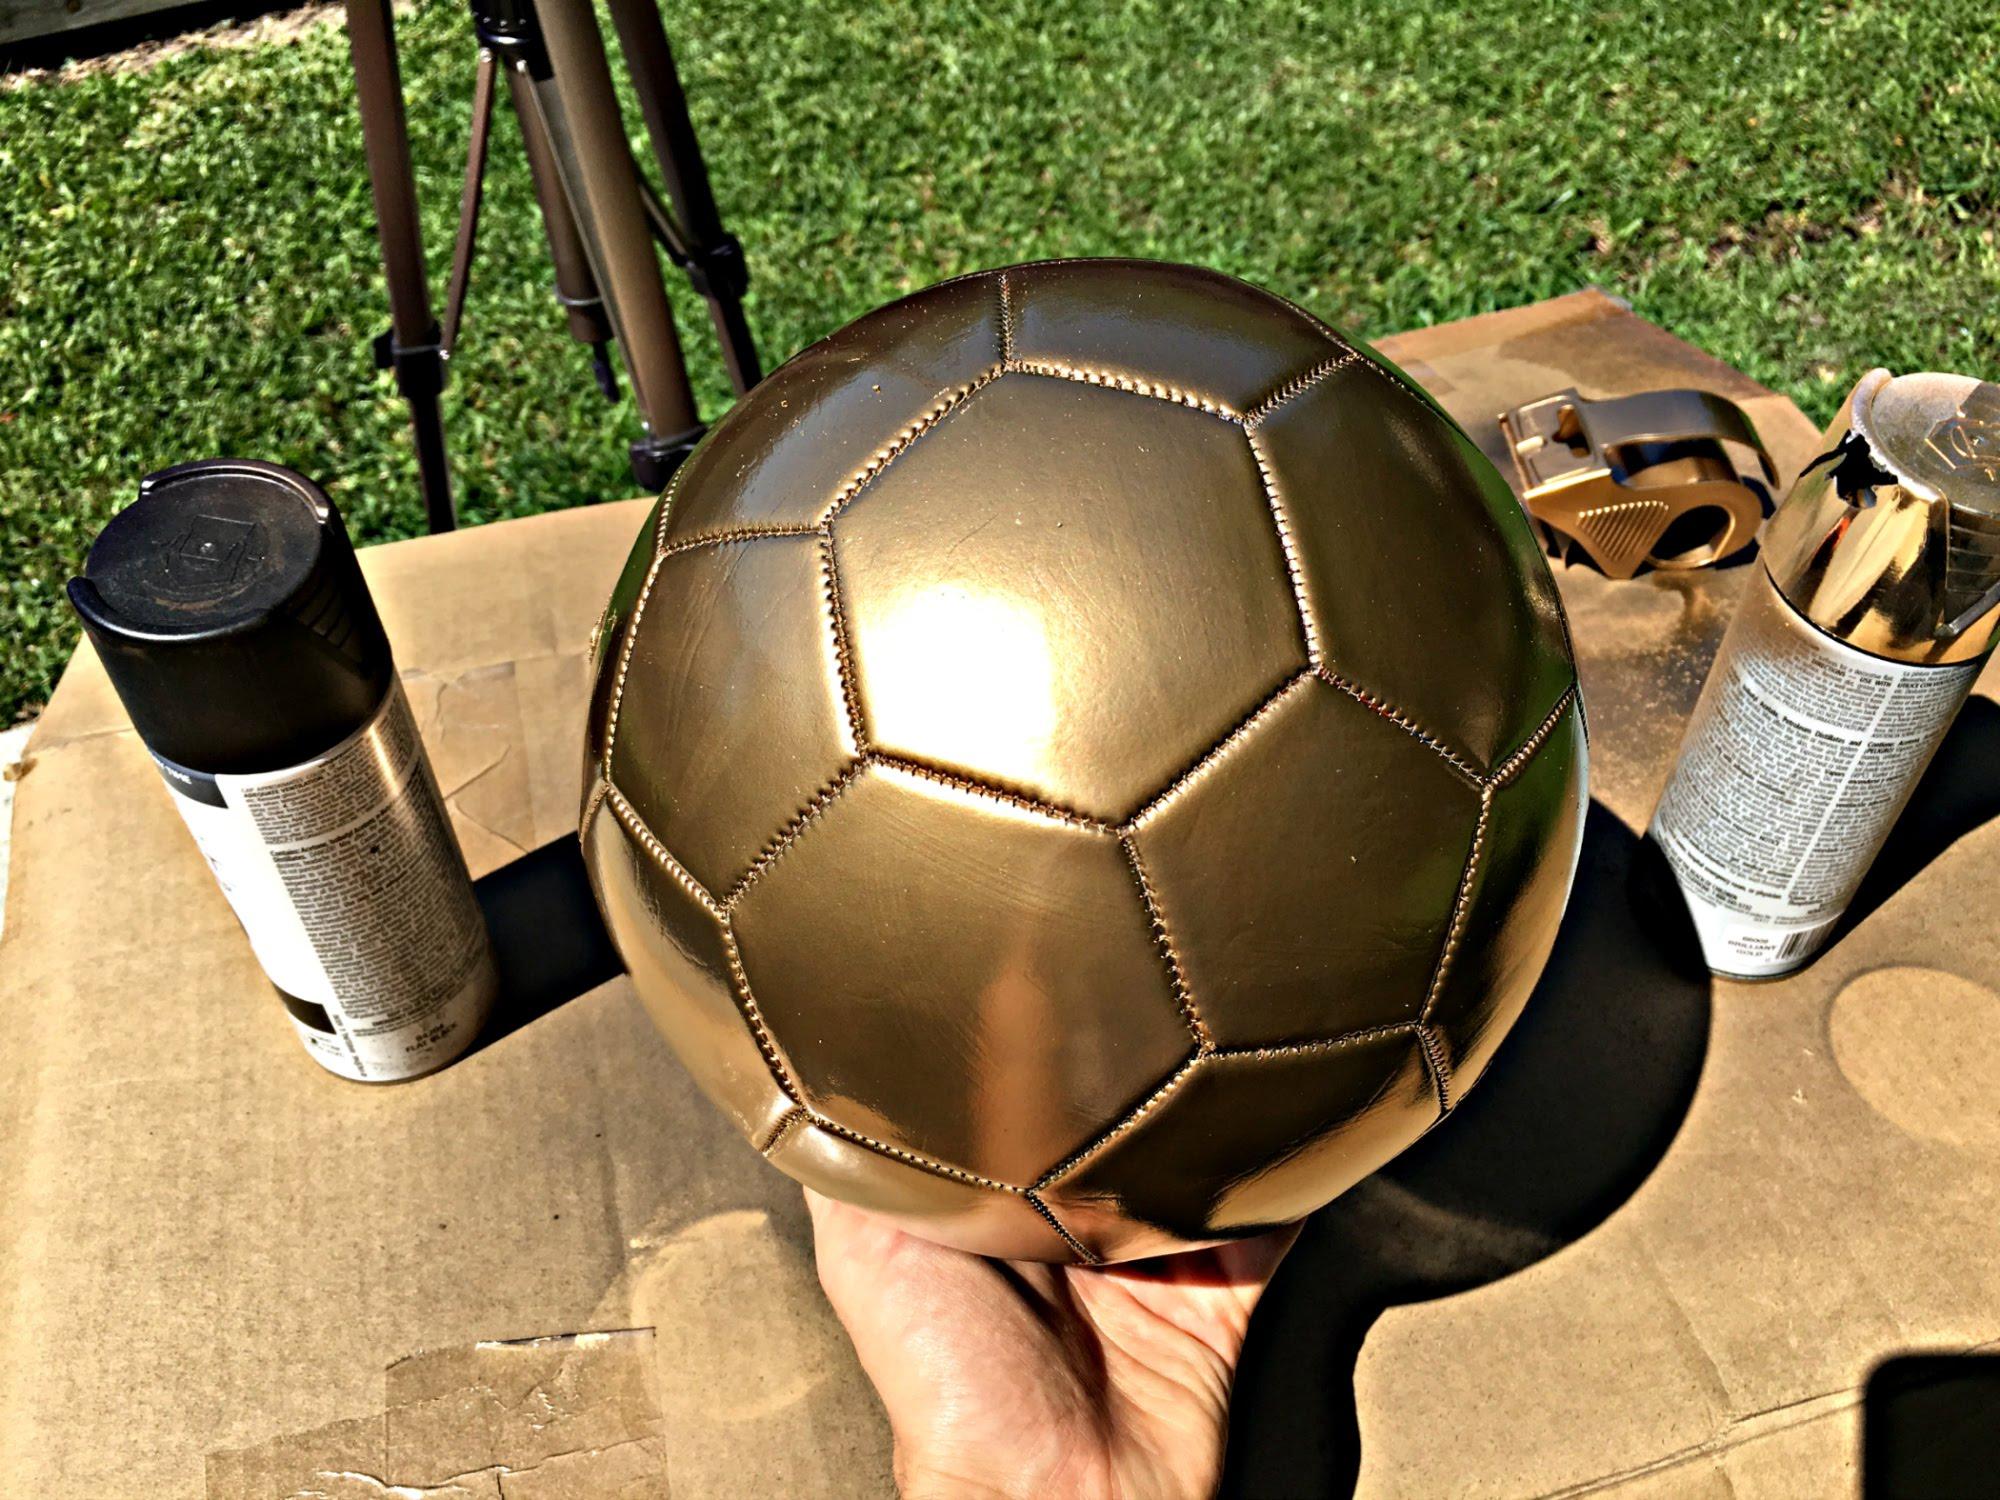 Drawn pokeball nike soccer Soccer GOLD Ball Your How